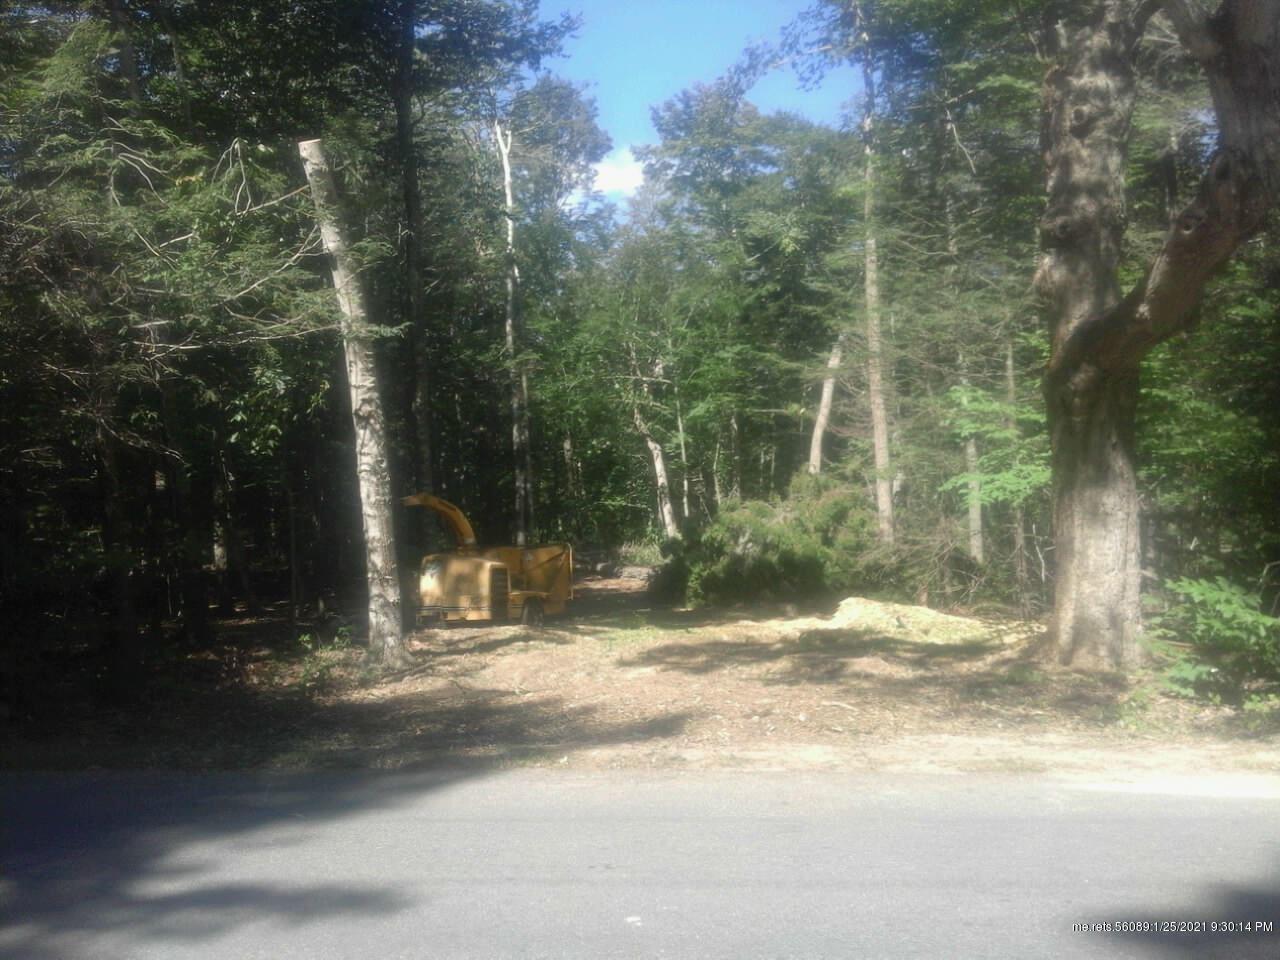 Photo of 0 North Road, Chebeague Island, ME 04110 (MLS # 1480599)